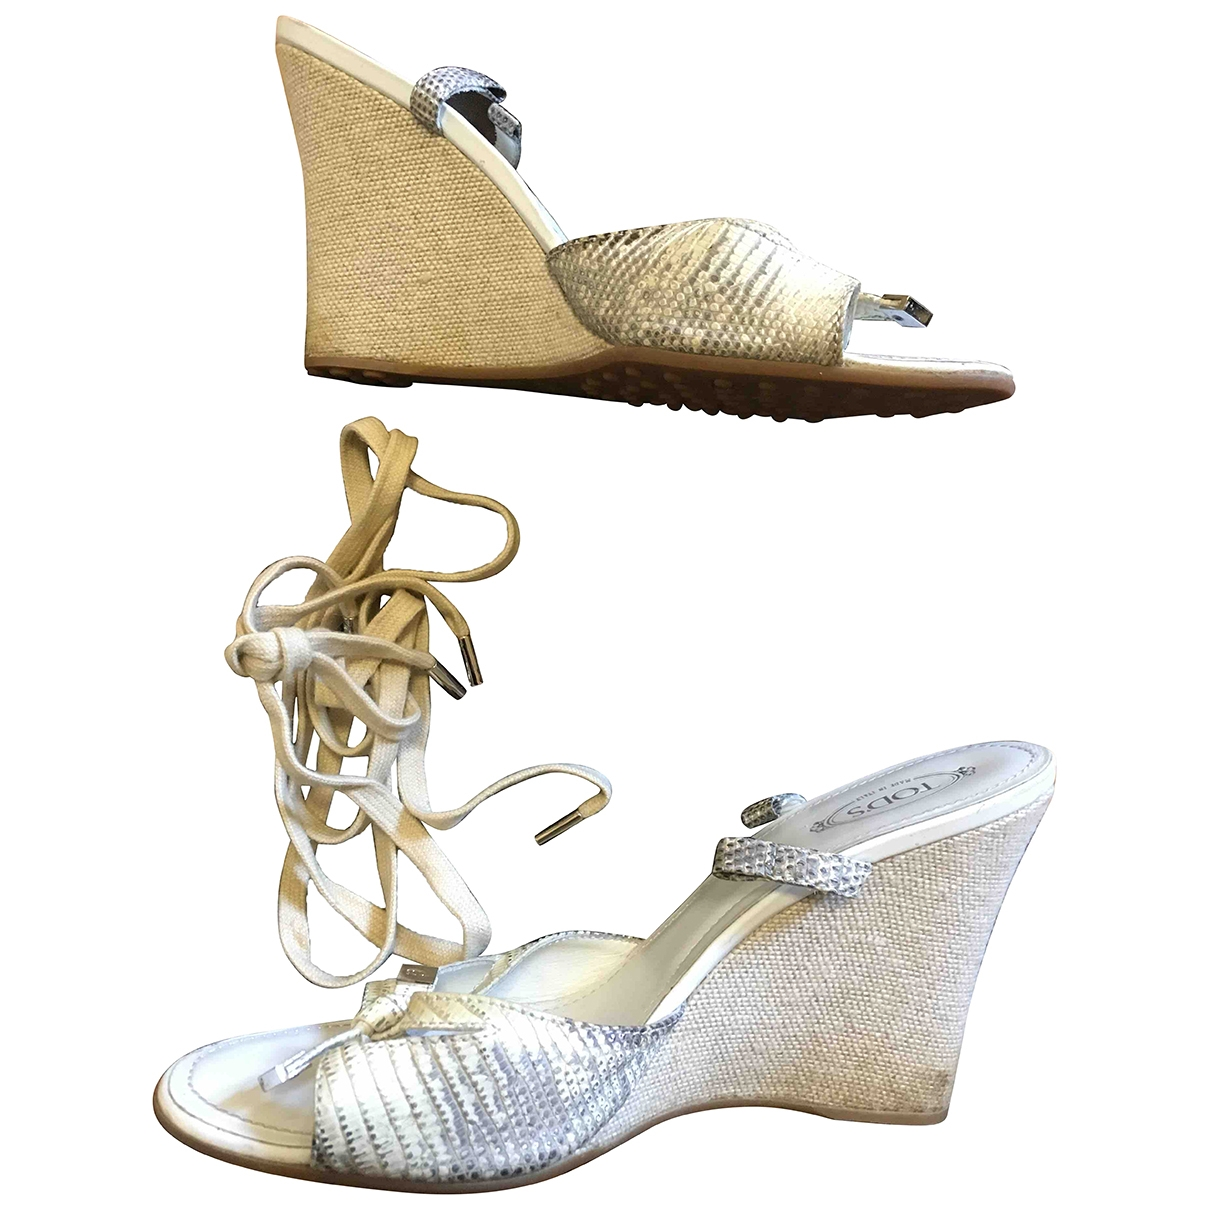 Sandalias romanas de Cuero Tods